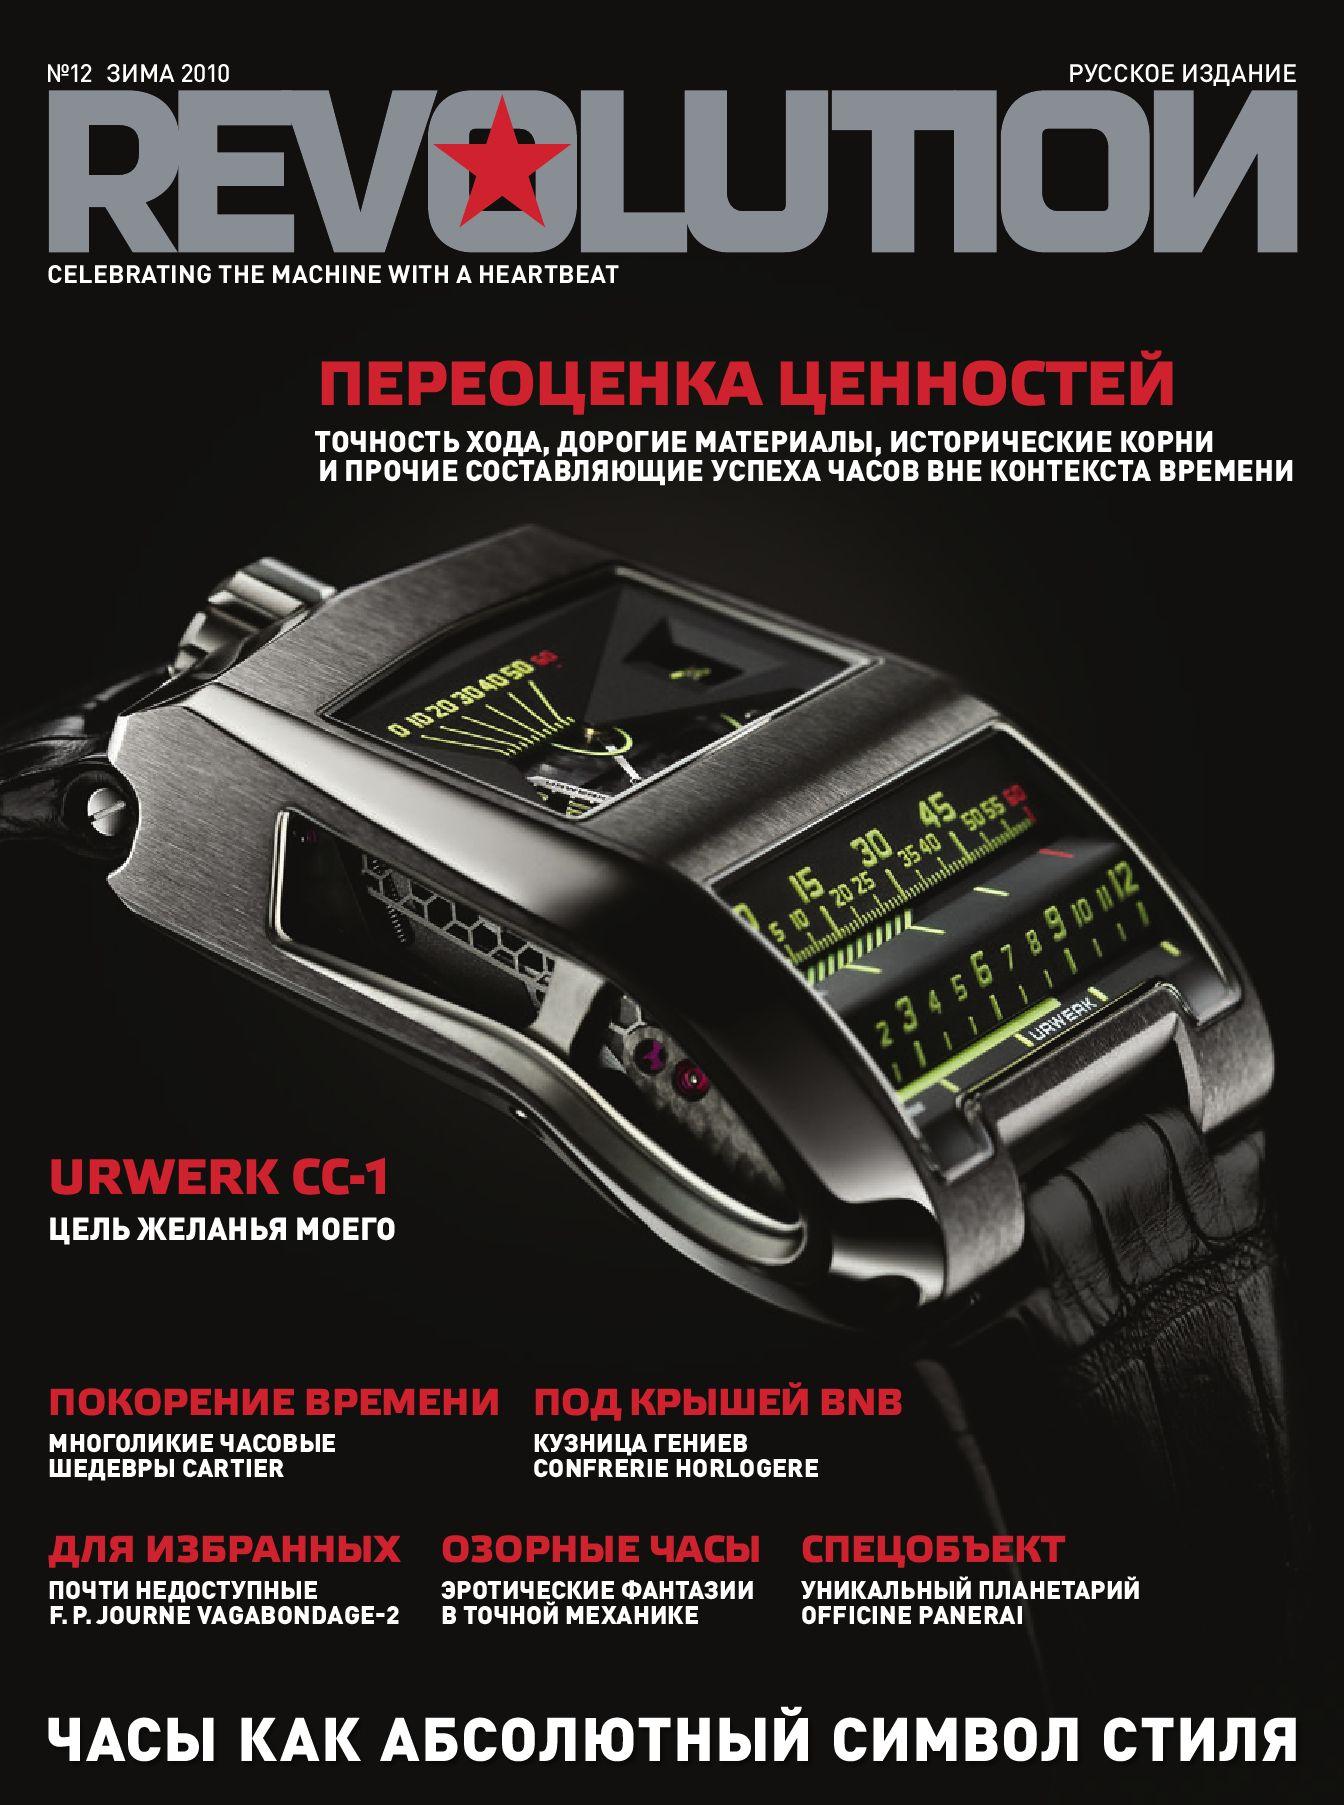 Revolution  12 2009 by Denis Peshkov - issuu 347e8001e43